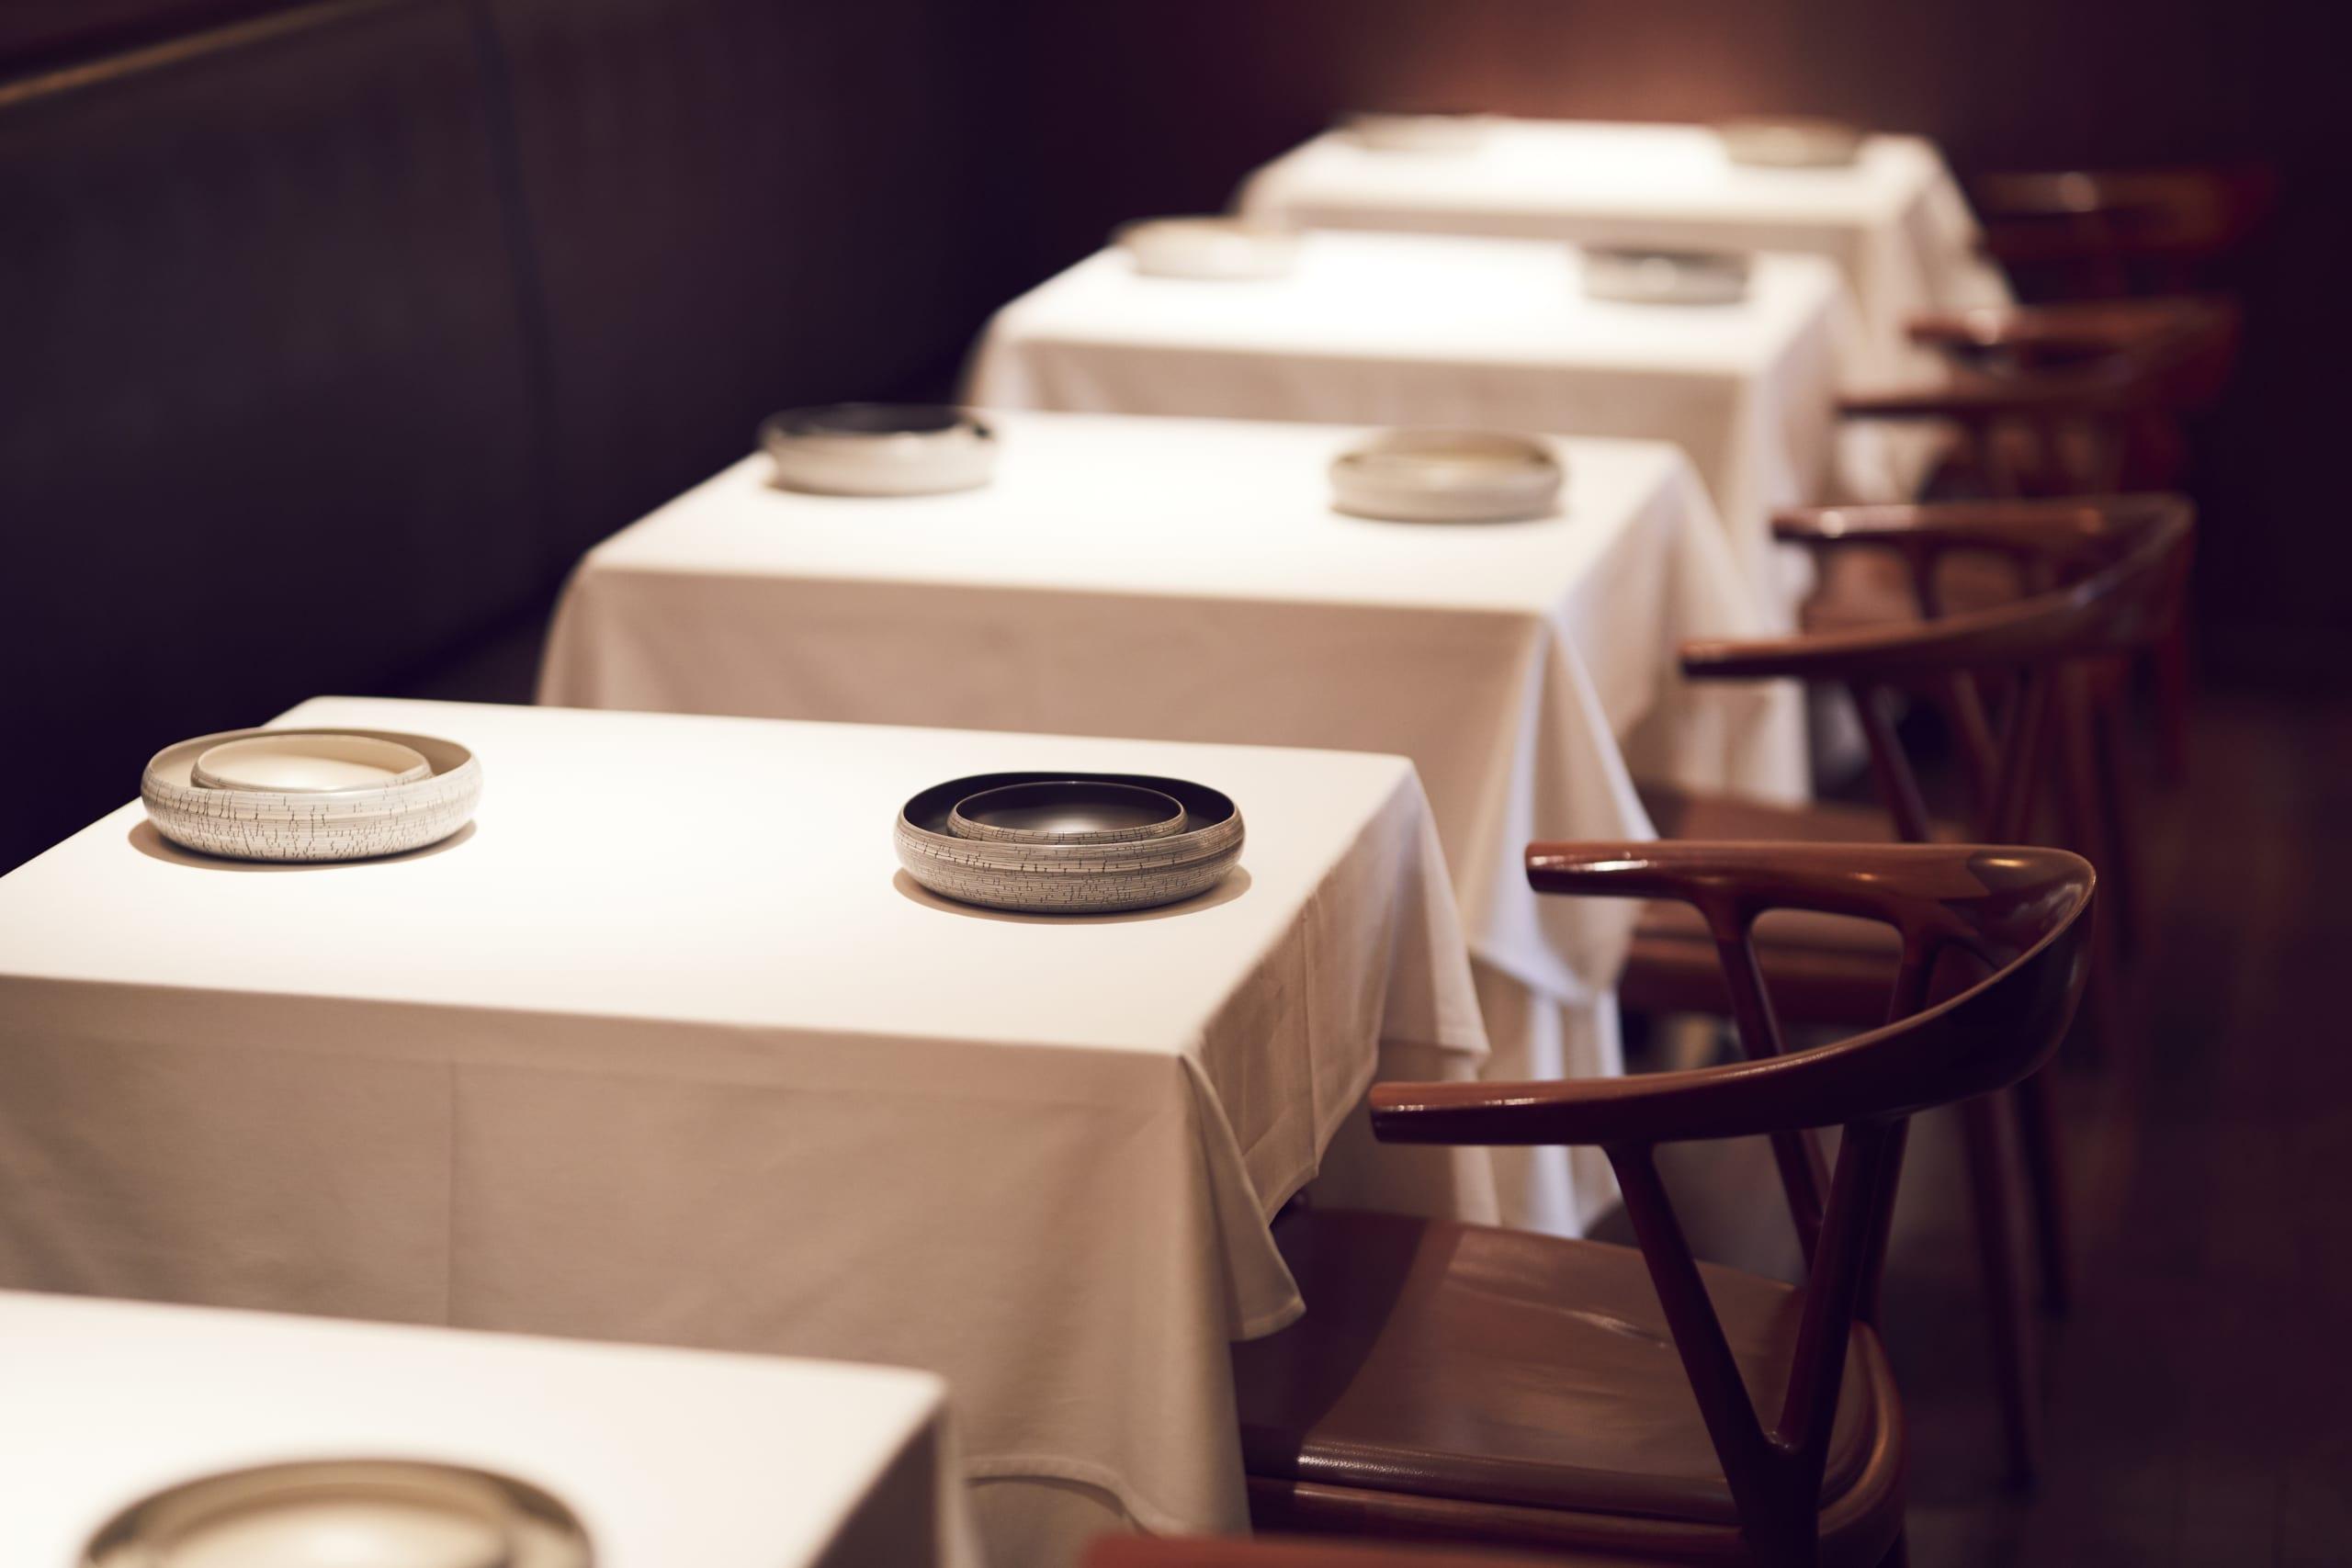 200716 HOMMAGE 0021s1 scaled 2 Star Michelin Chef Noboru Arai   Restaurant Hommage Tokyo meets Rochini